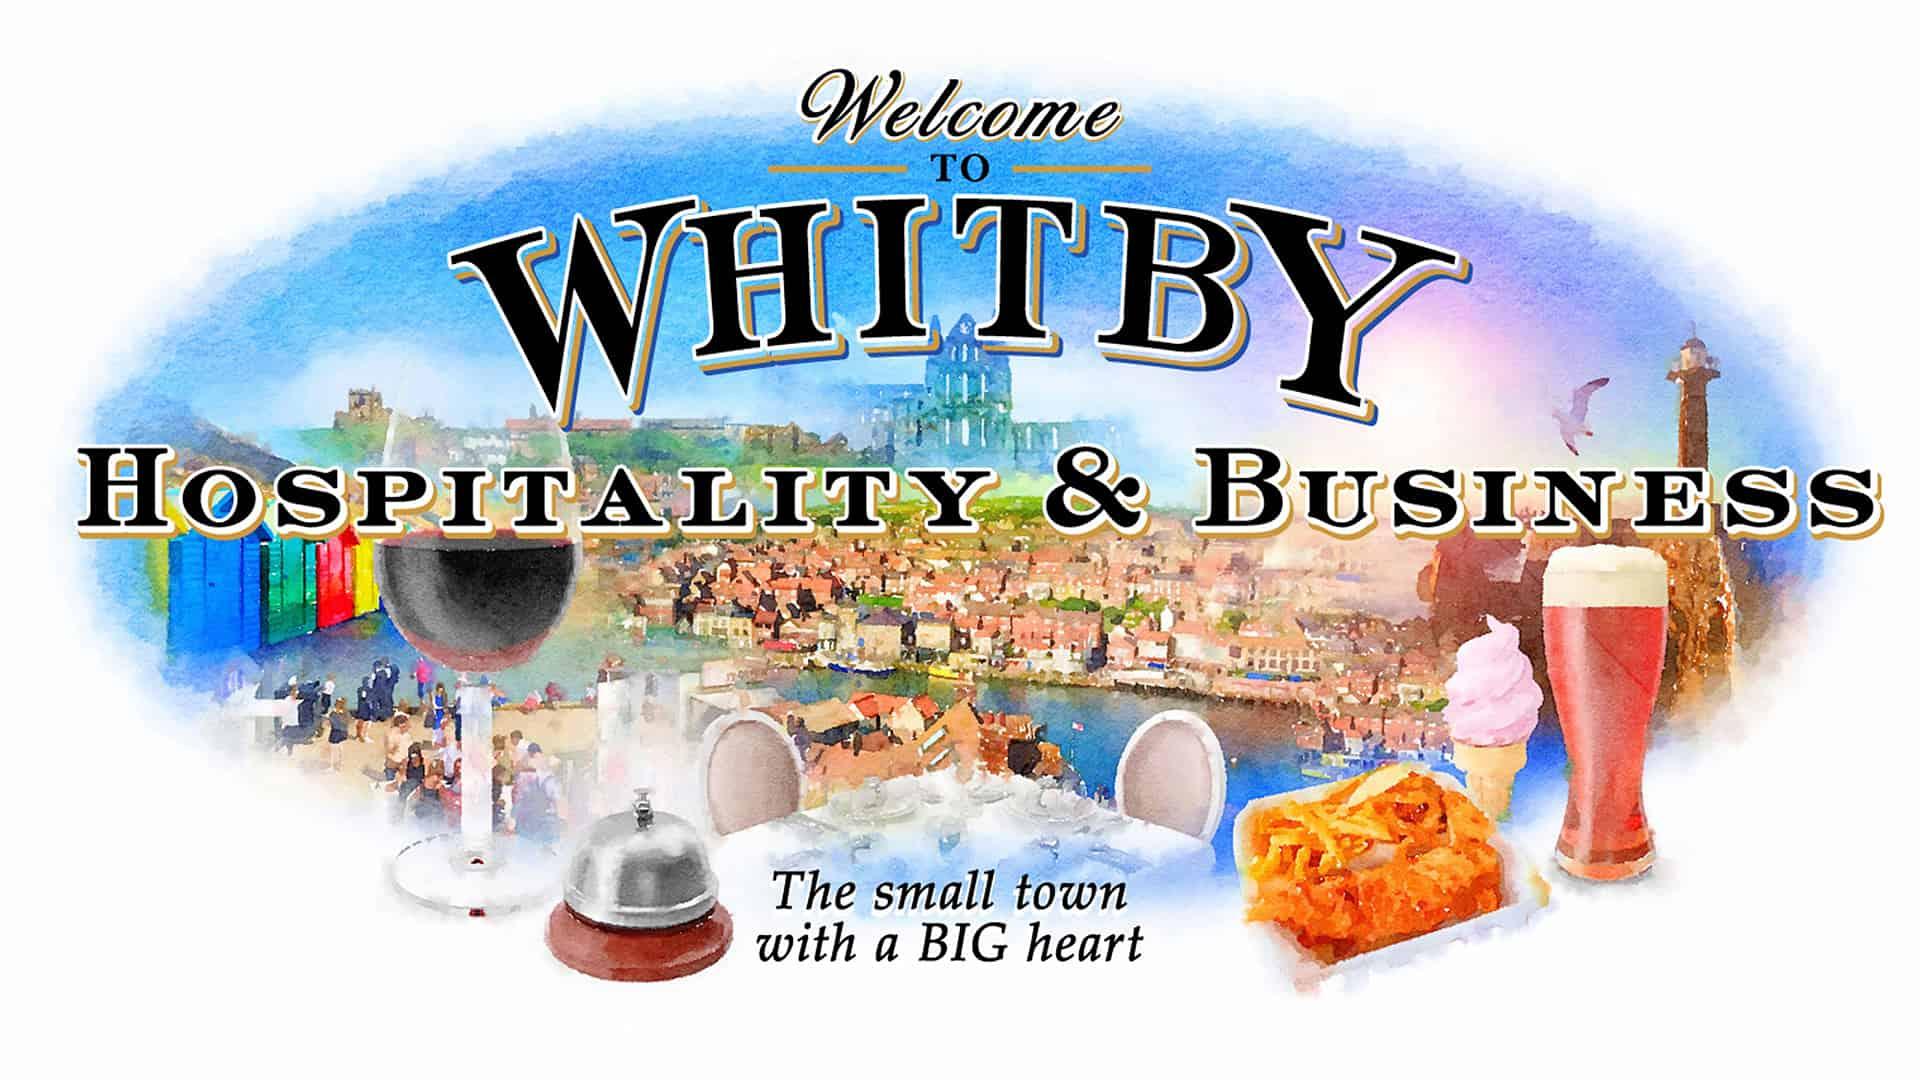 Whitby Image 7